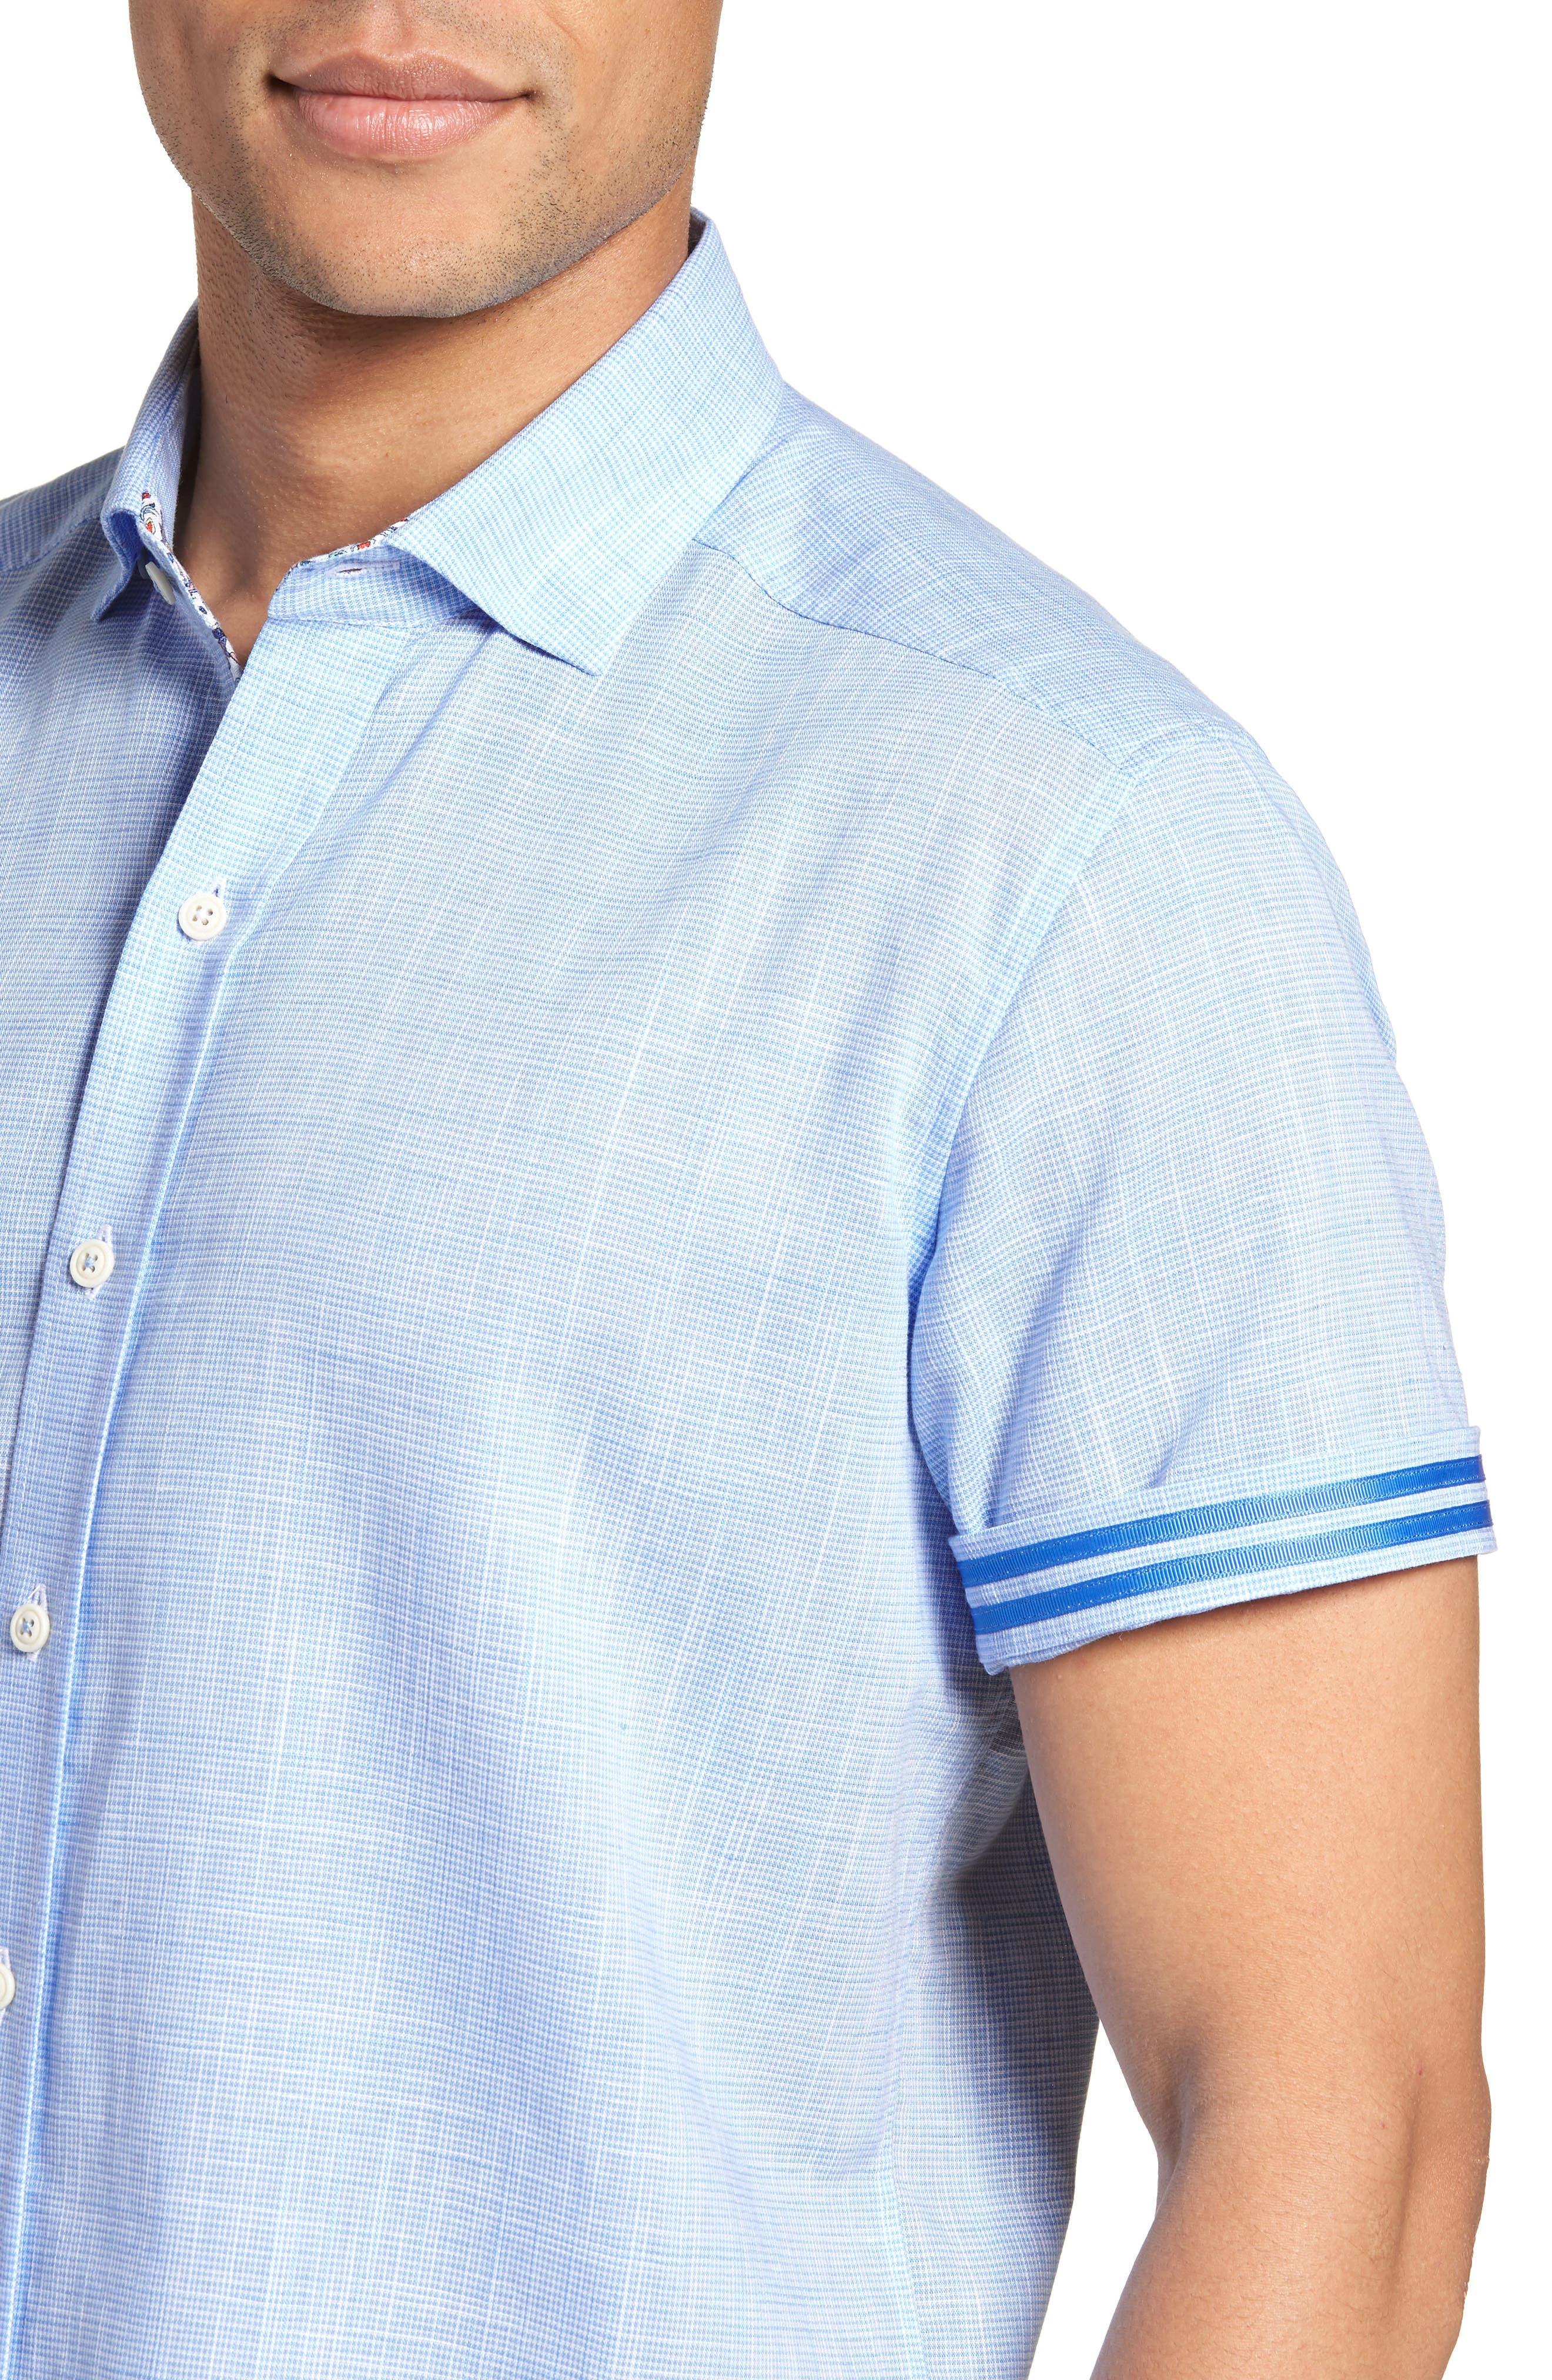 ROBERT GRAHAM,                             Isia Tailored Fit Sport Shirt,                             Alternate thumbnail 4, color,                             400